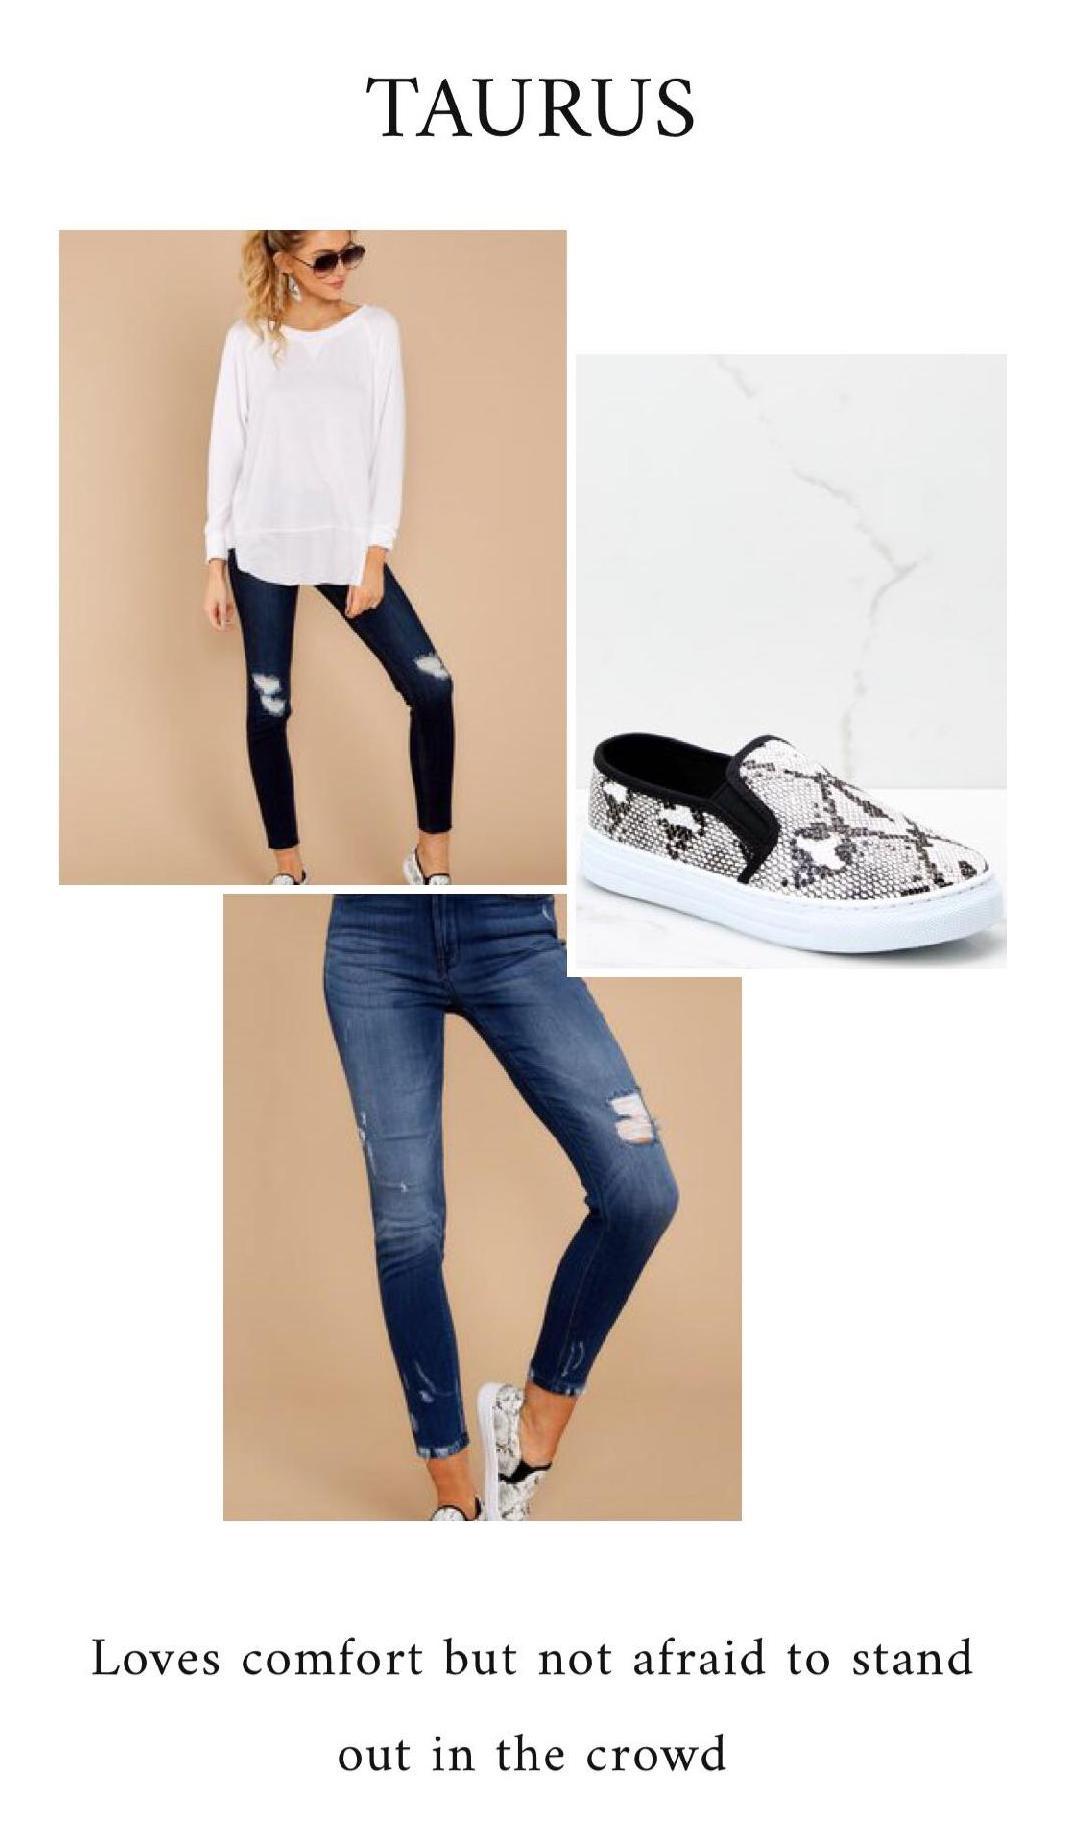 GET THE LOOK - Don't Forget Casual White SweatshirtDark Wash Distressed Skinny JeansSnakeskin Slip On Sneakers